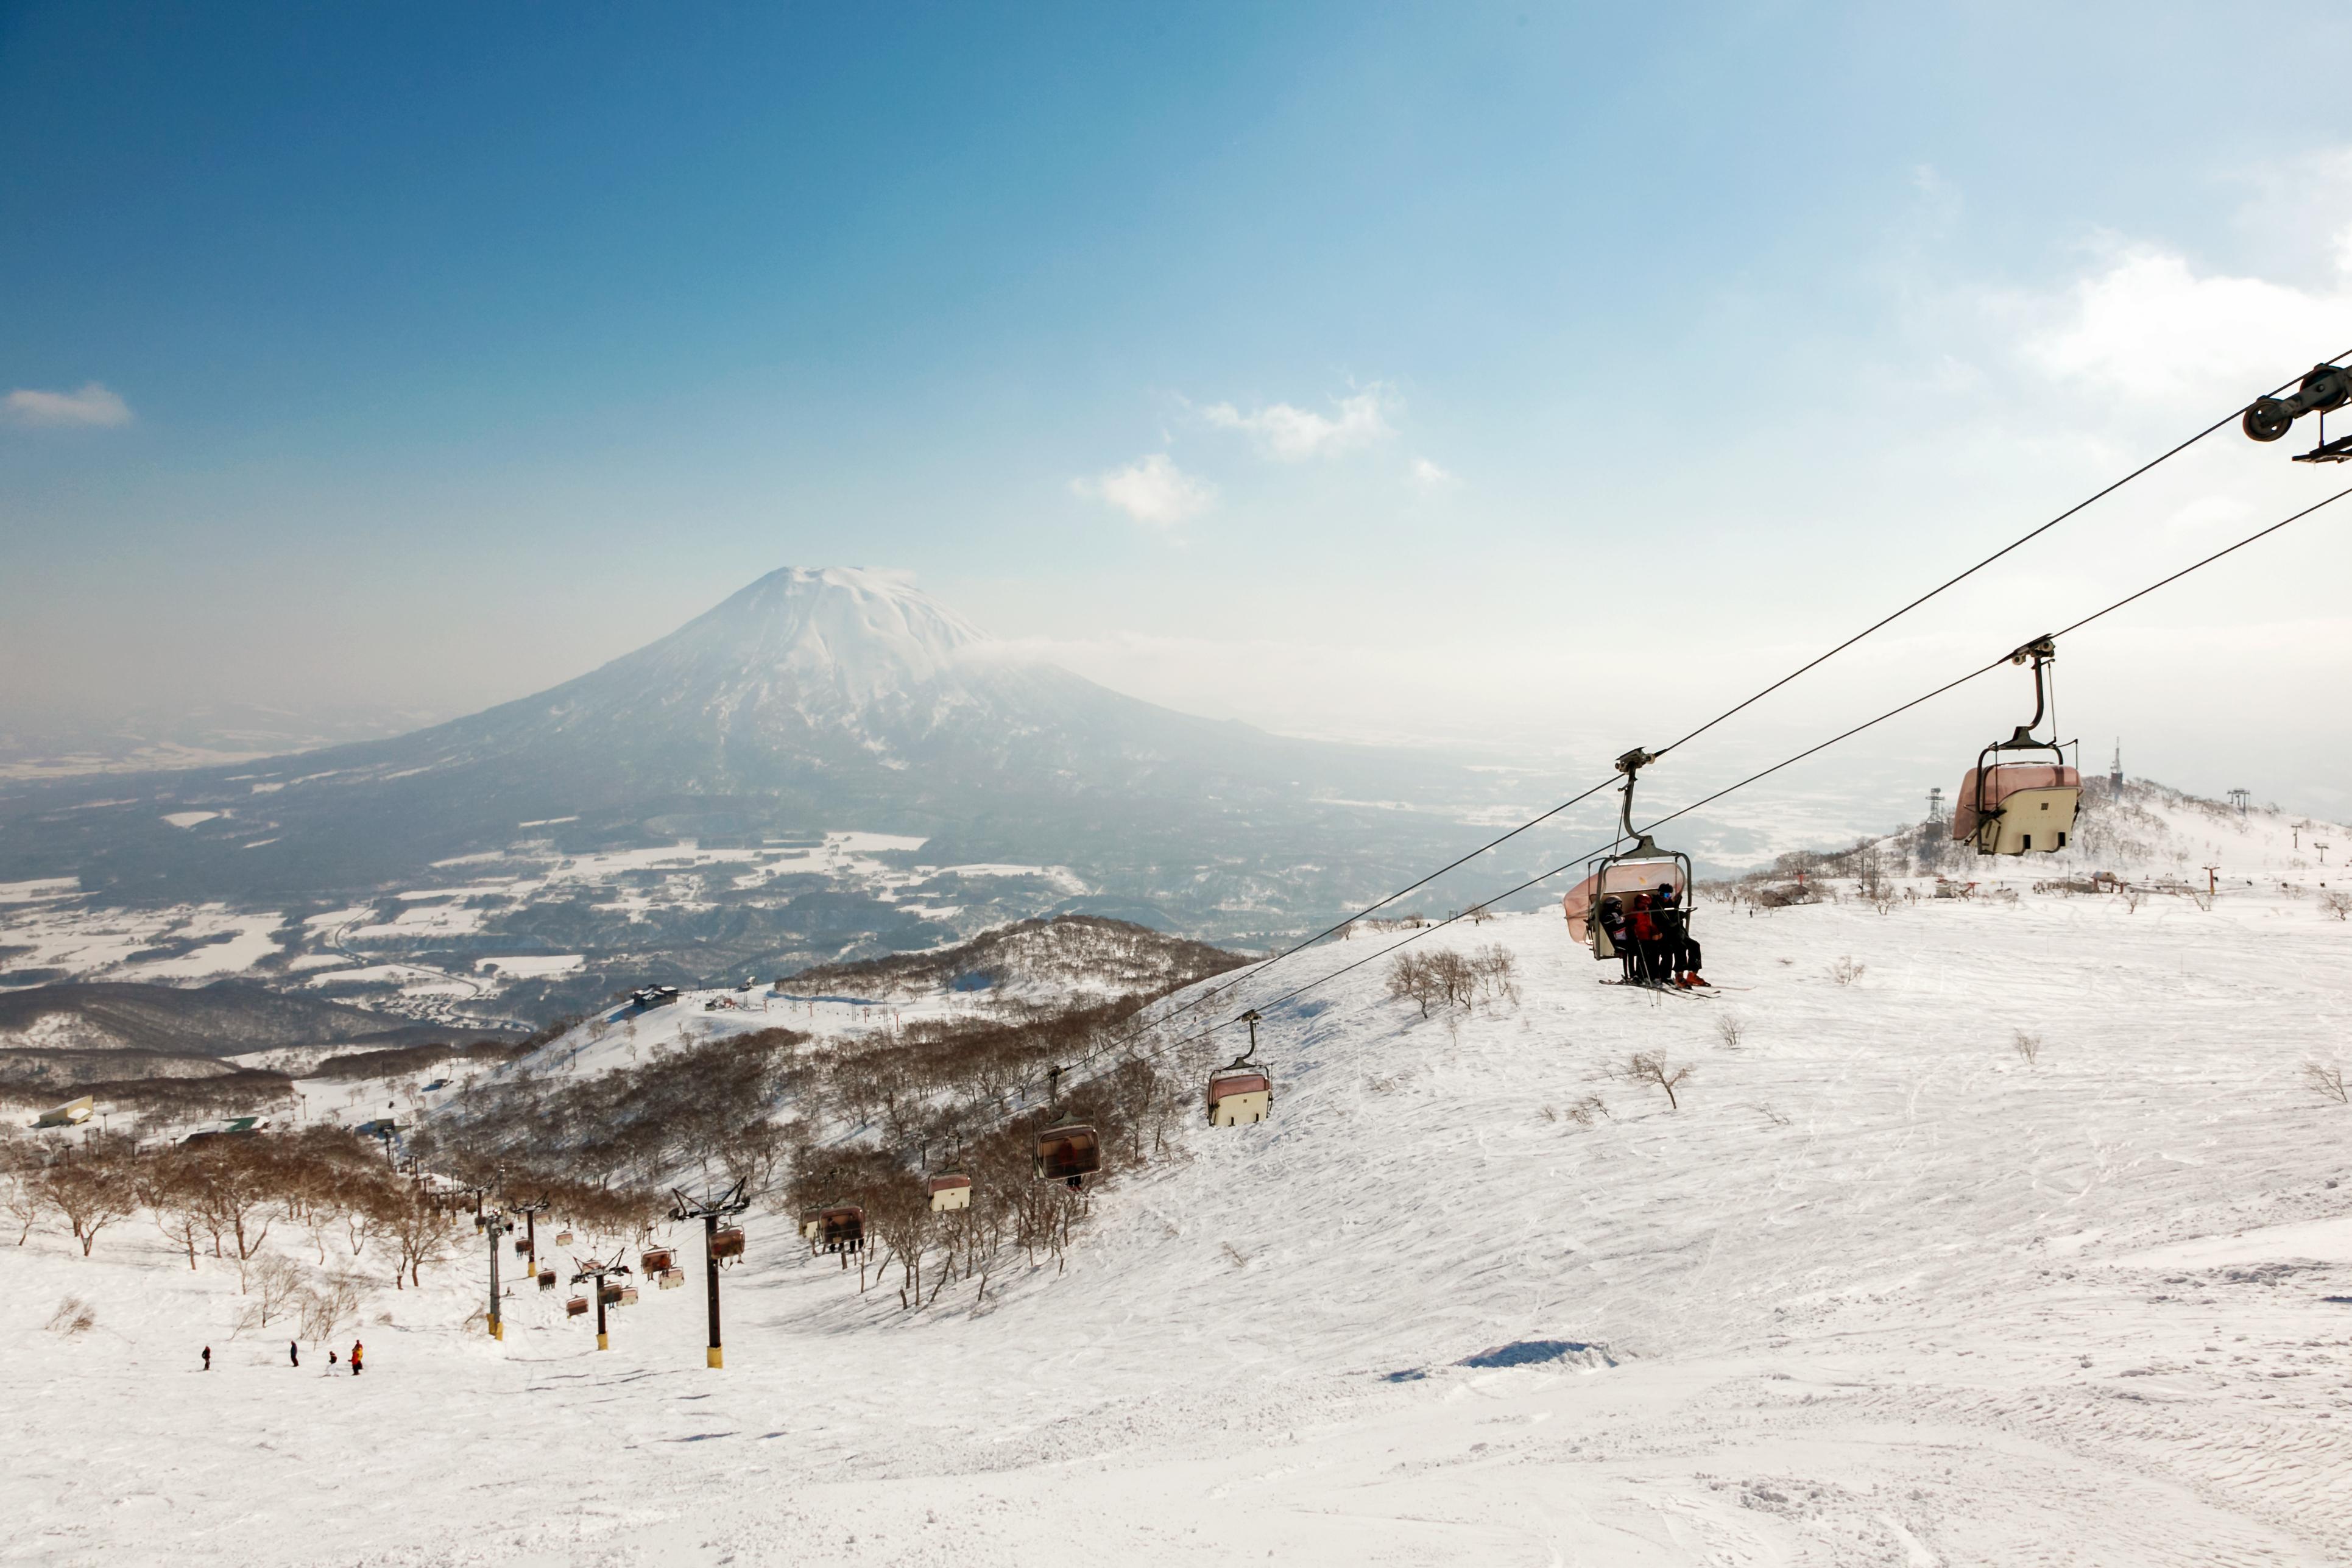 Ski Lift, Niseko Village Ski Resort, Hokkaido, Japan